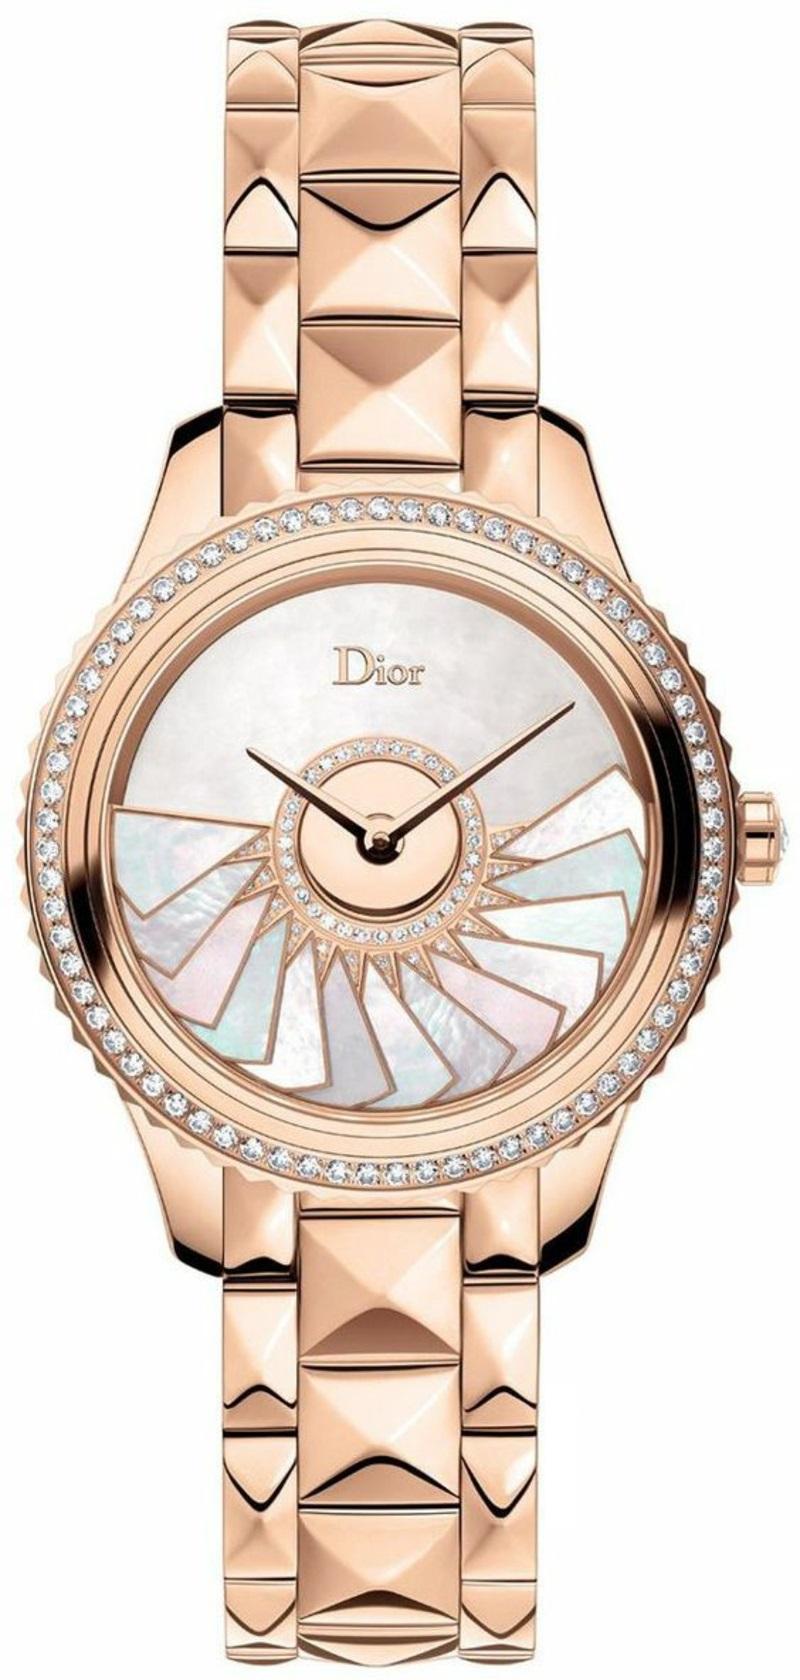 Dior Damenuhr rosegold Armbanduhr Damen